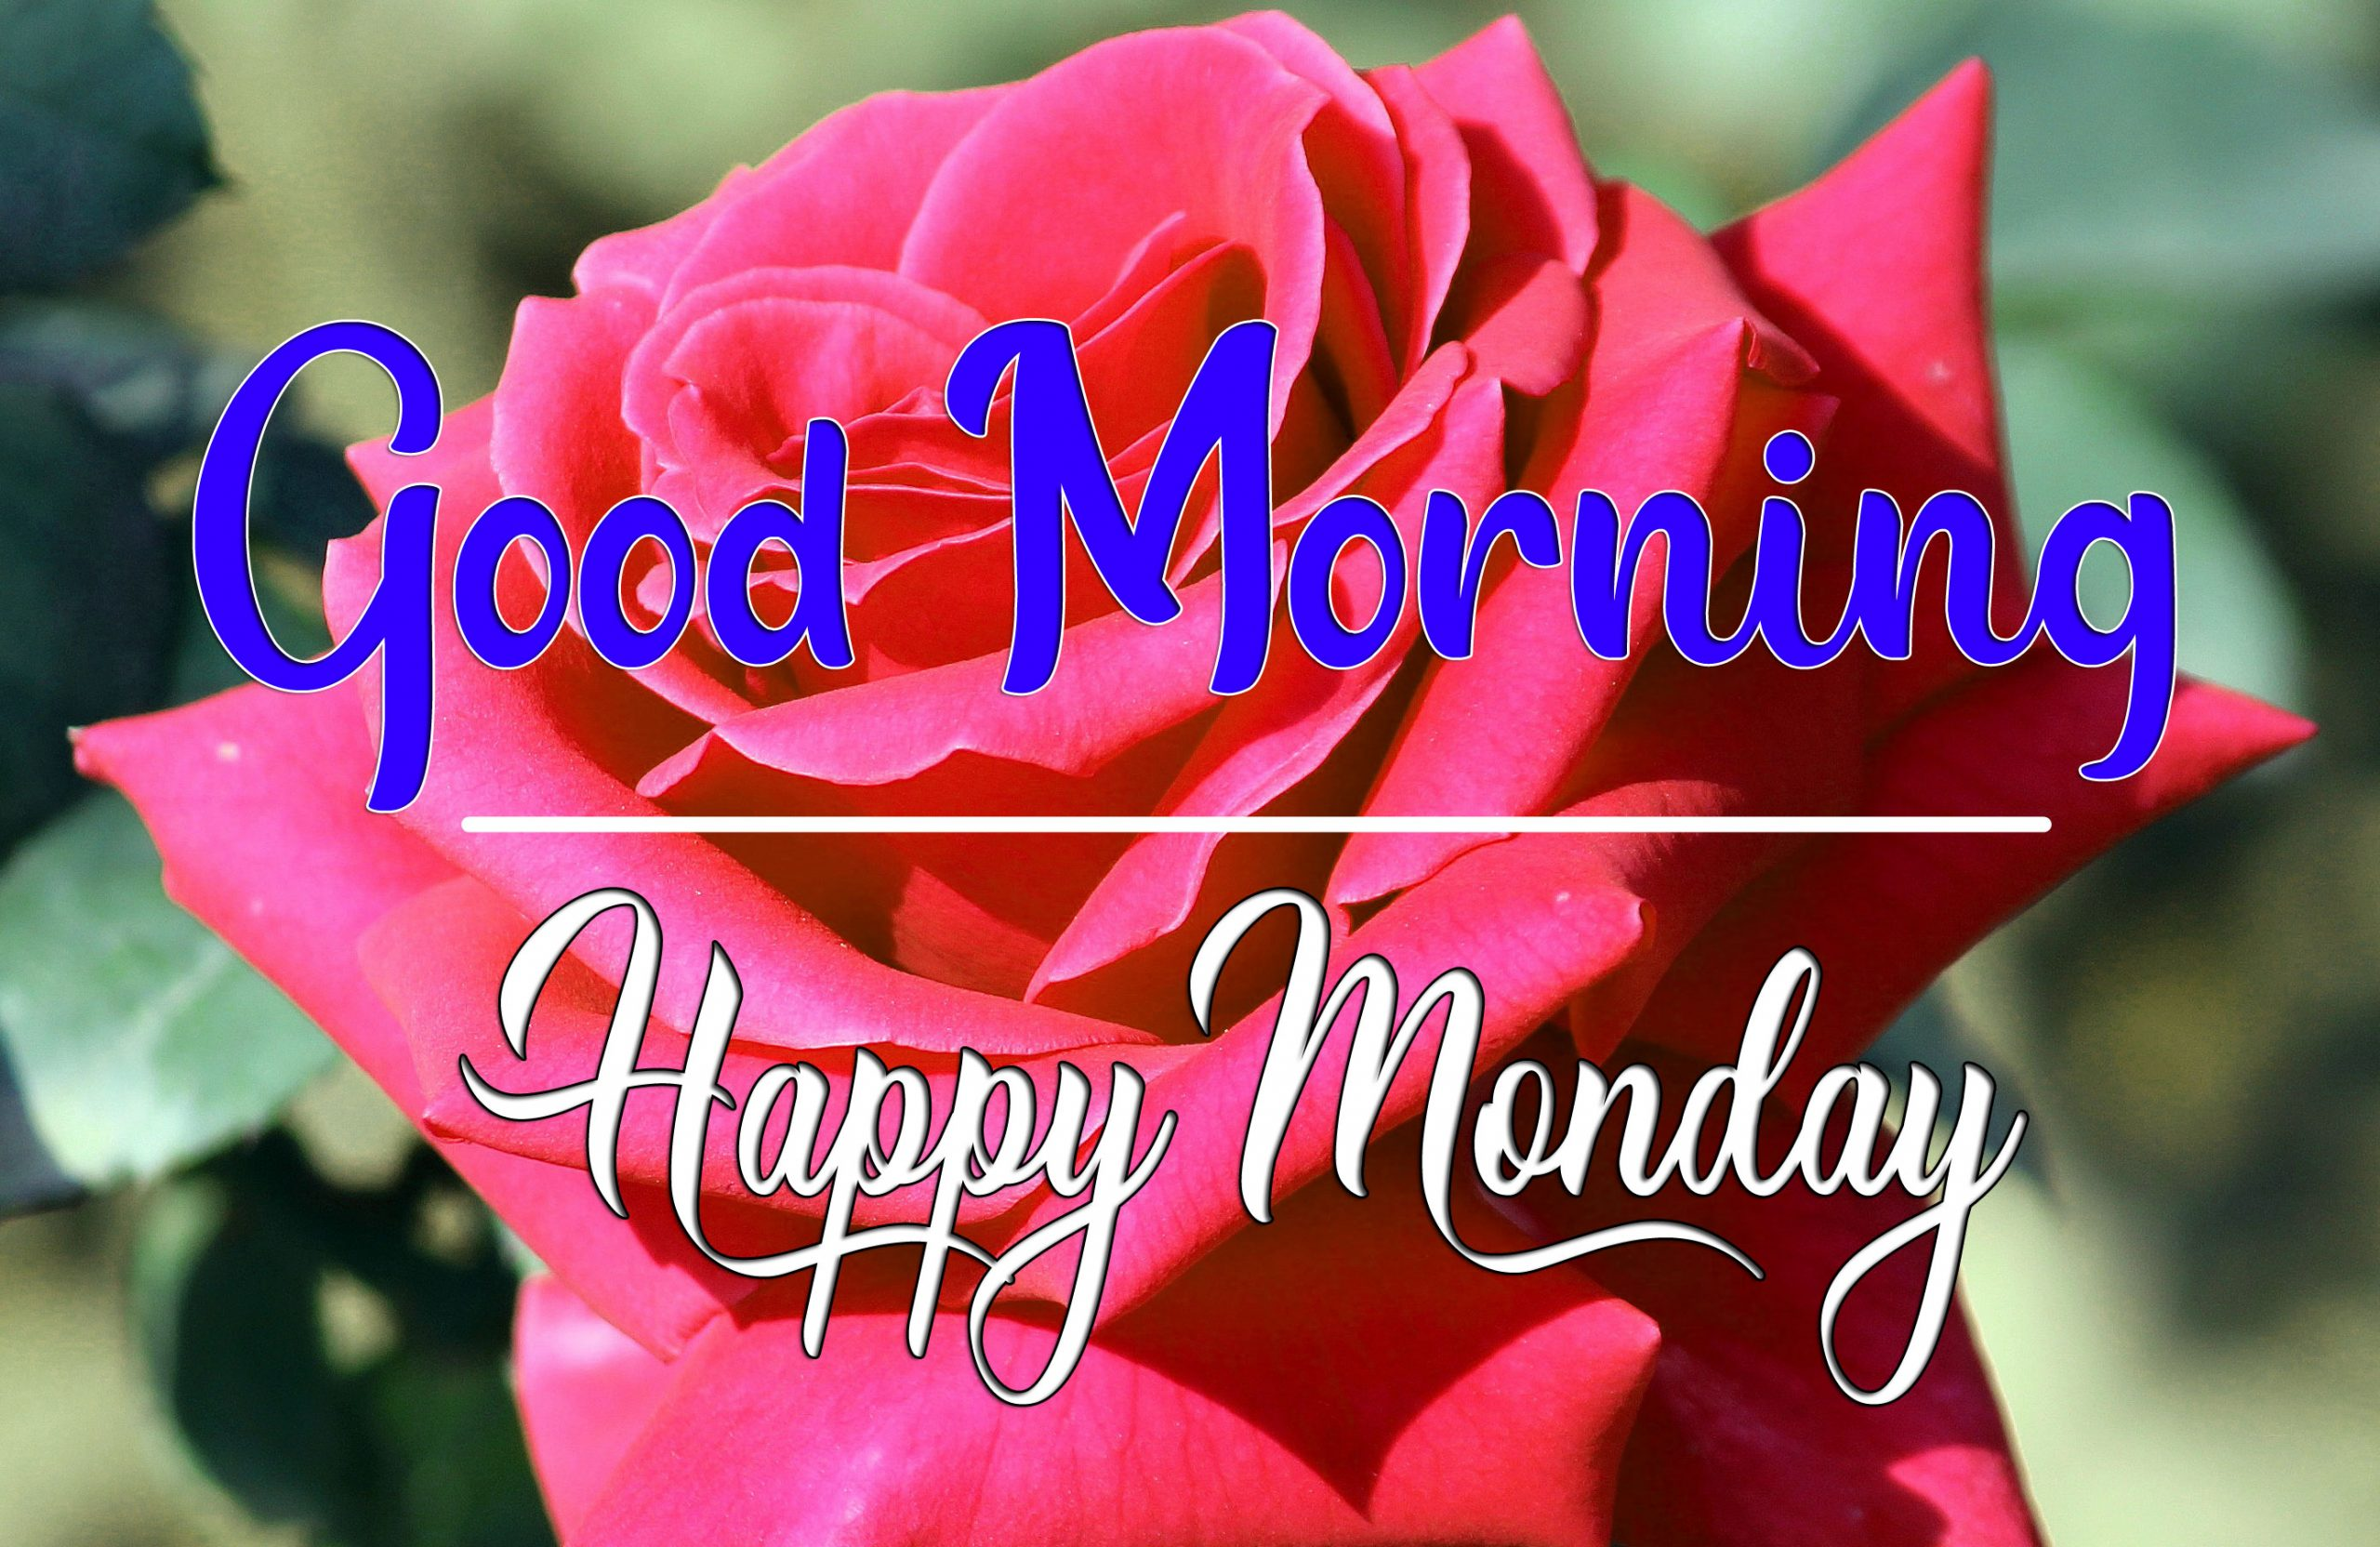 Monday Good Morning Wallpaper for Status 2